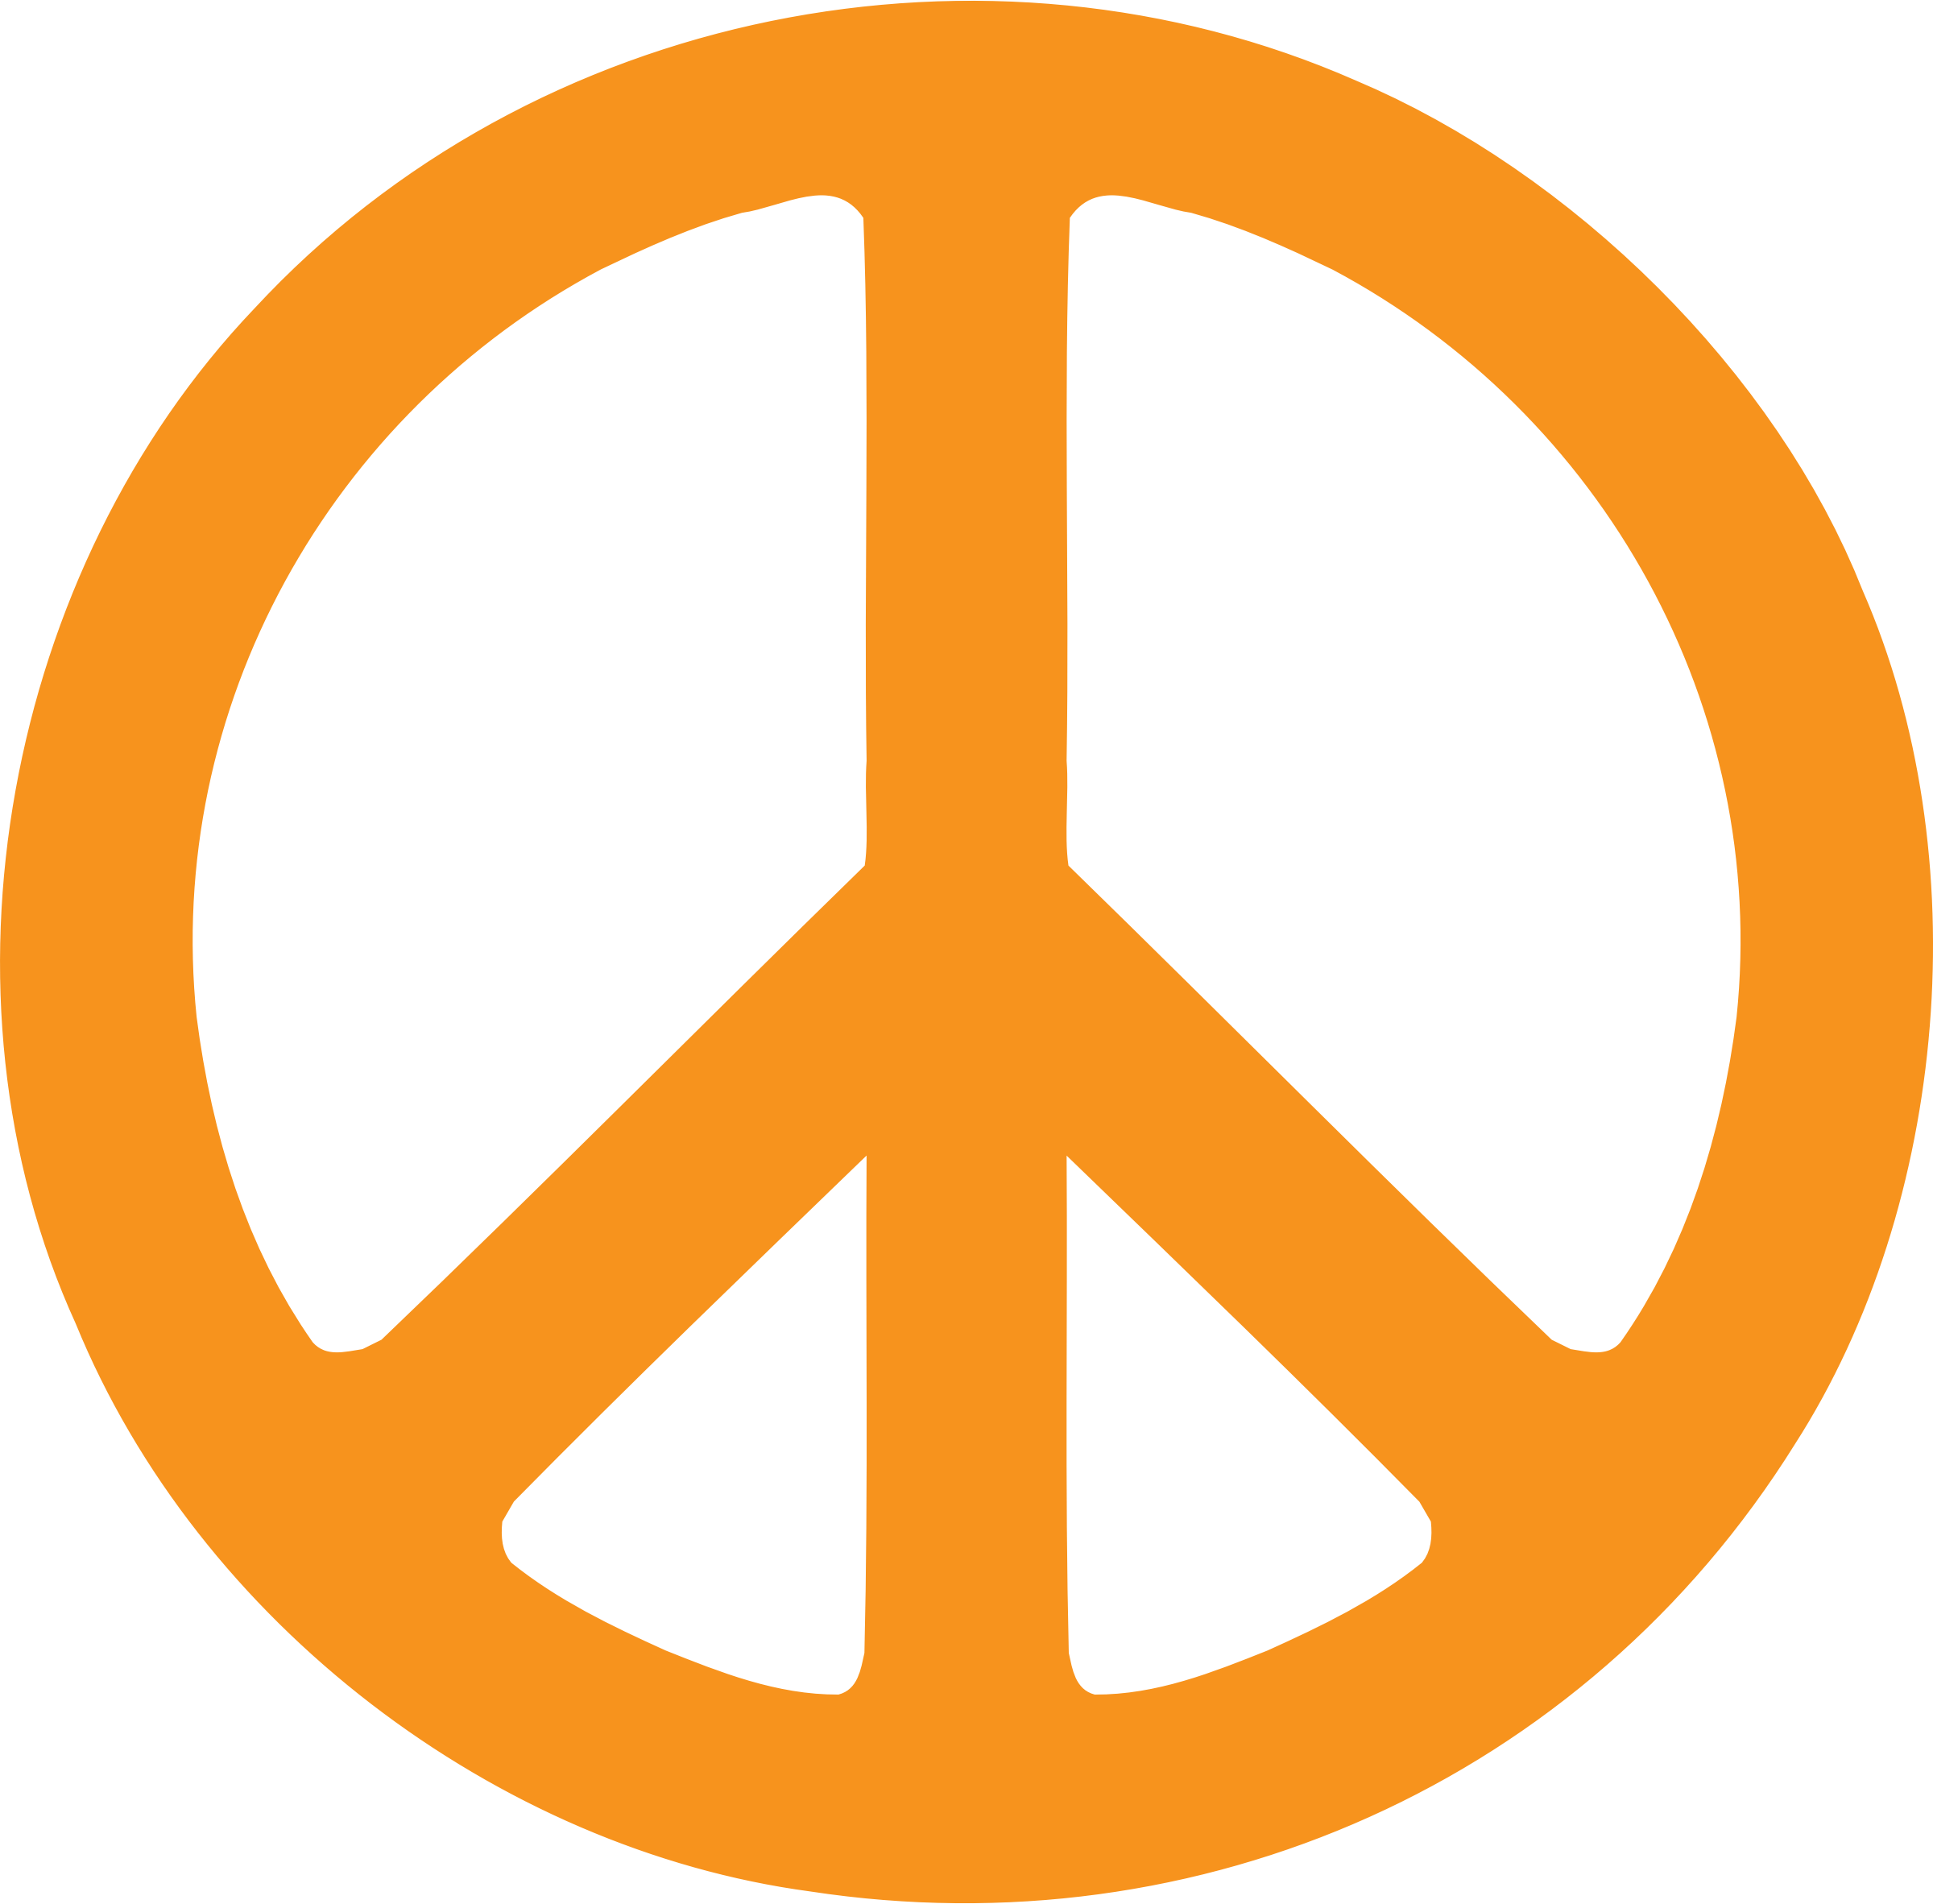 Orange peace sign clip art clipart download